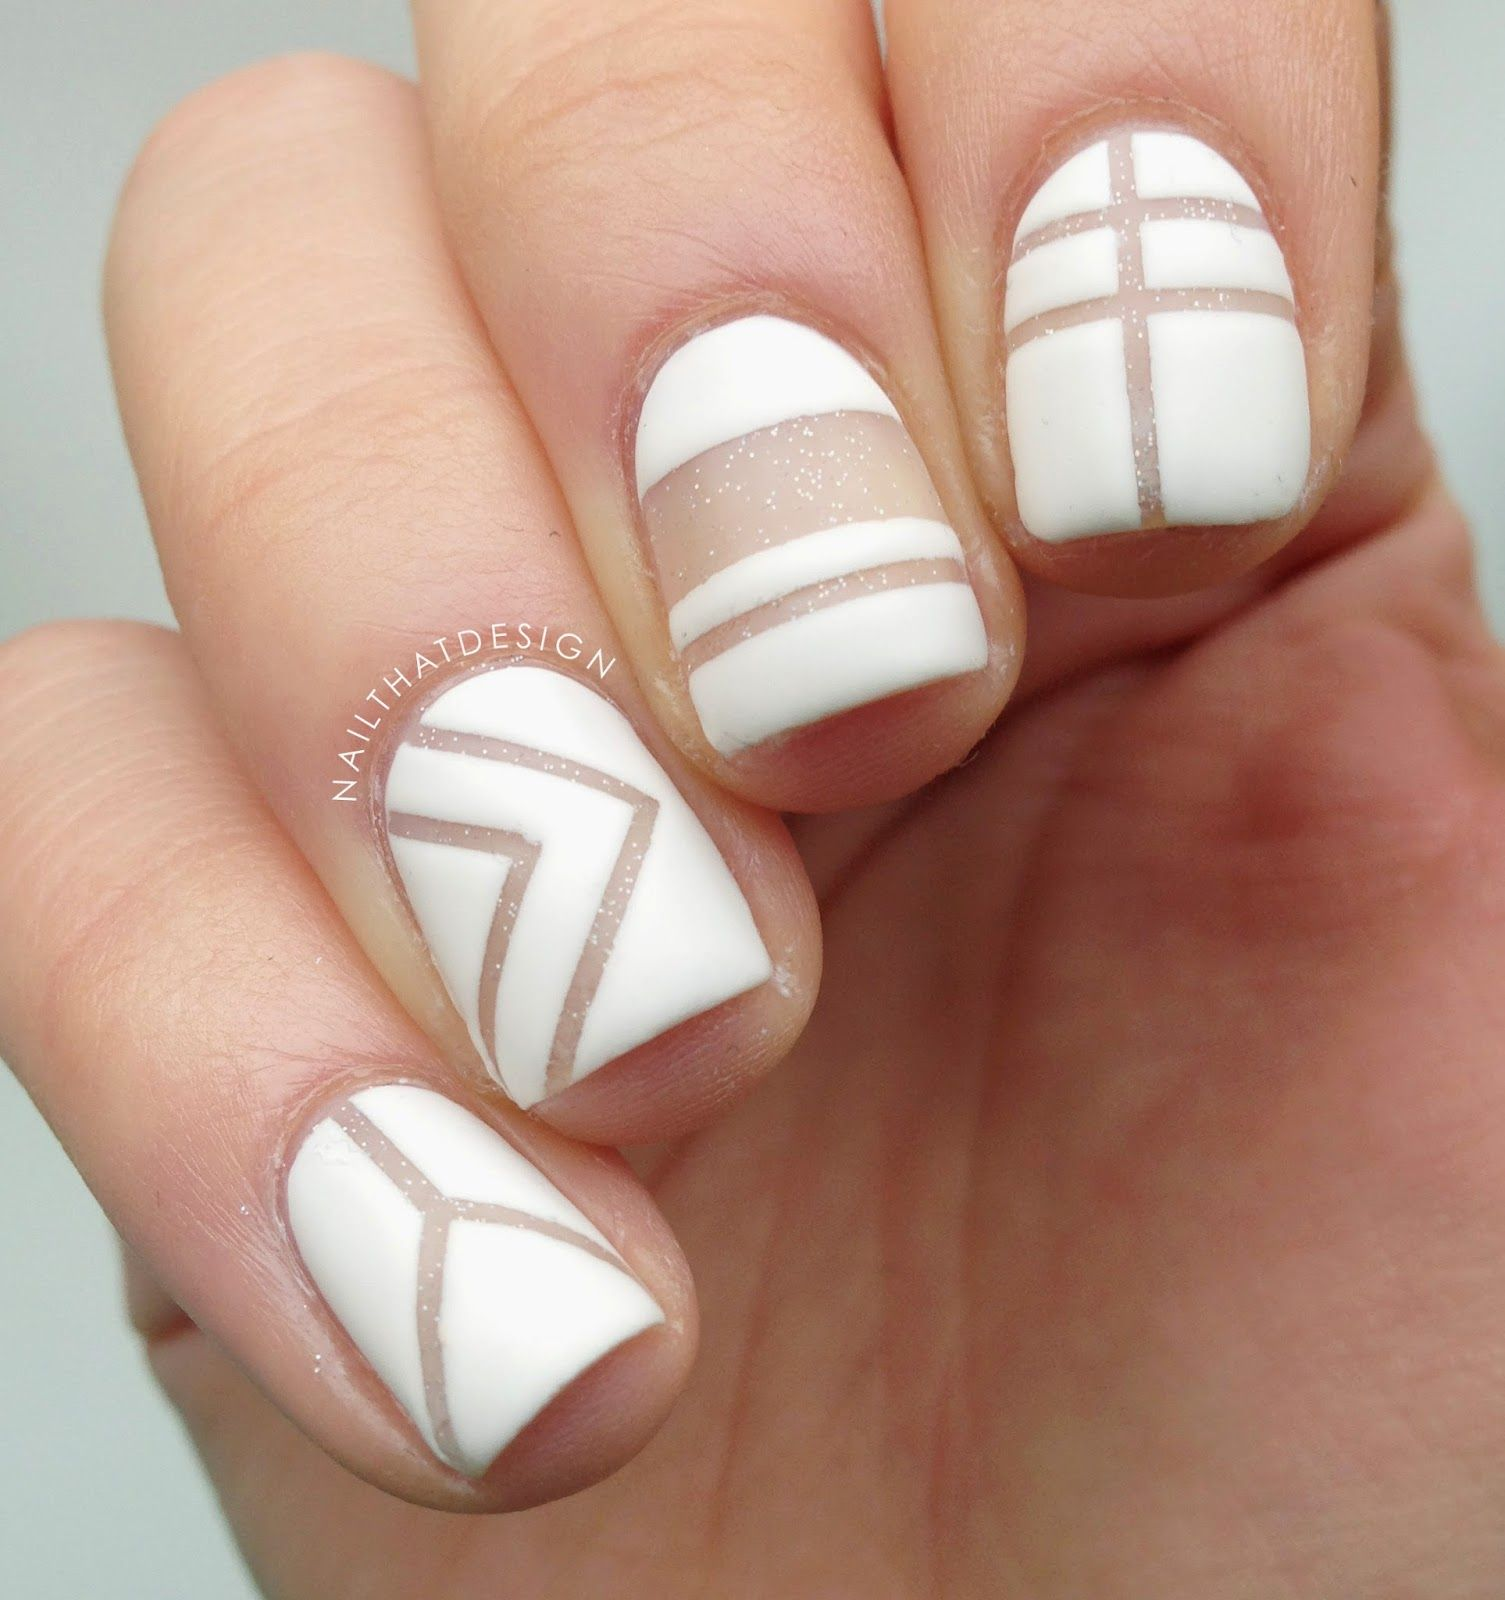 NailThatDesign: Negative Space Nail Art | Nails!! | Pinterest ...